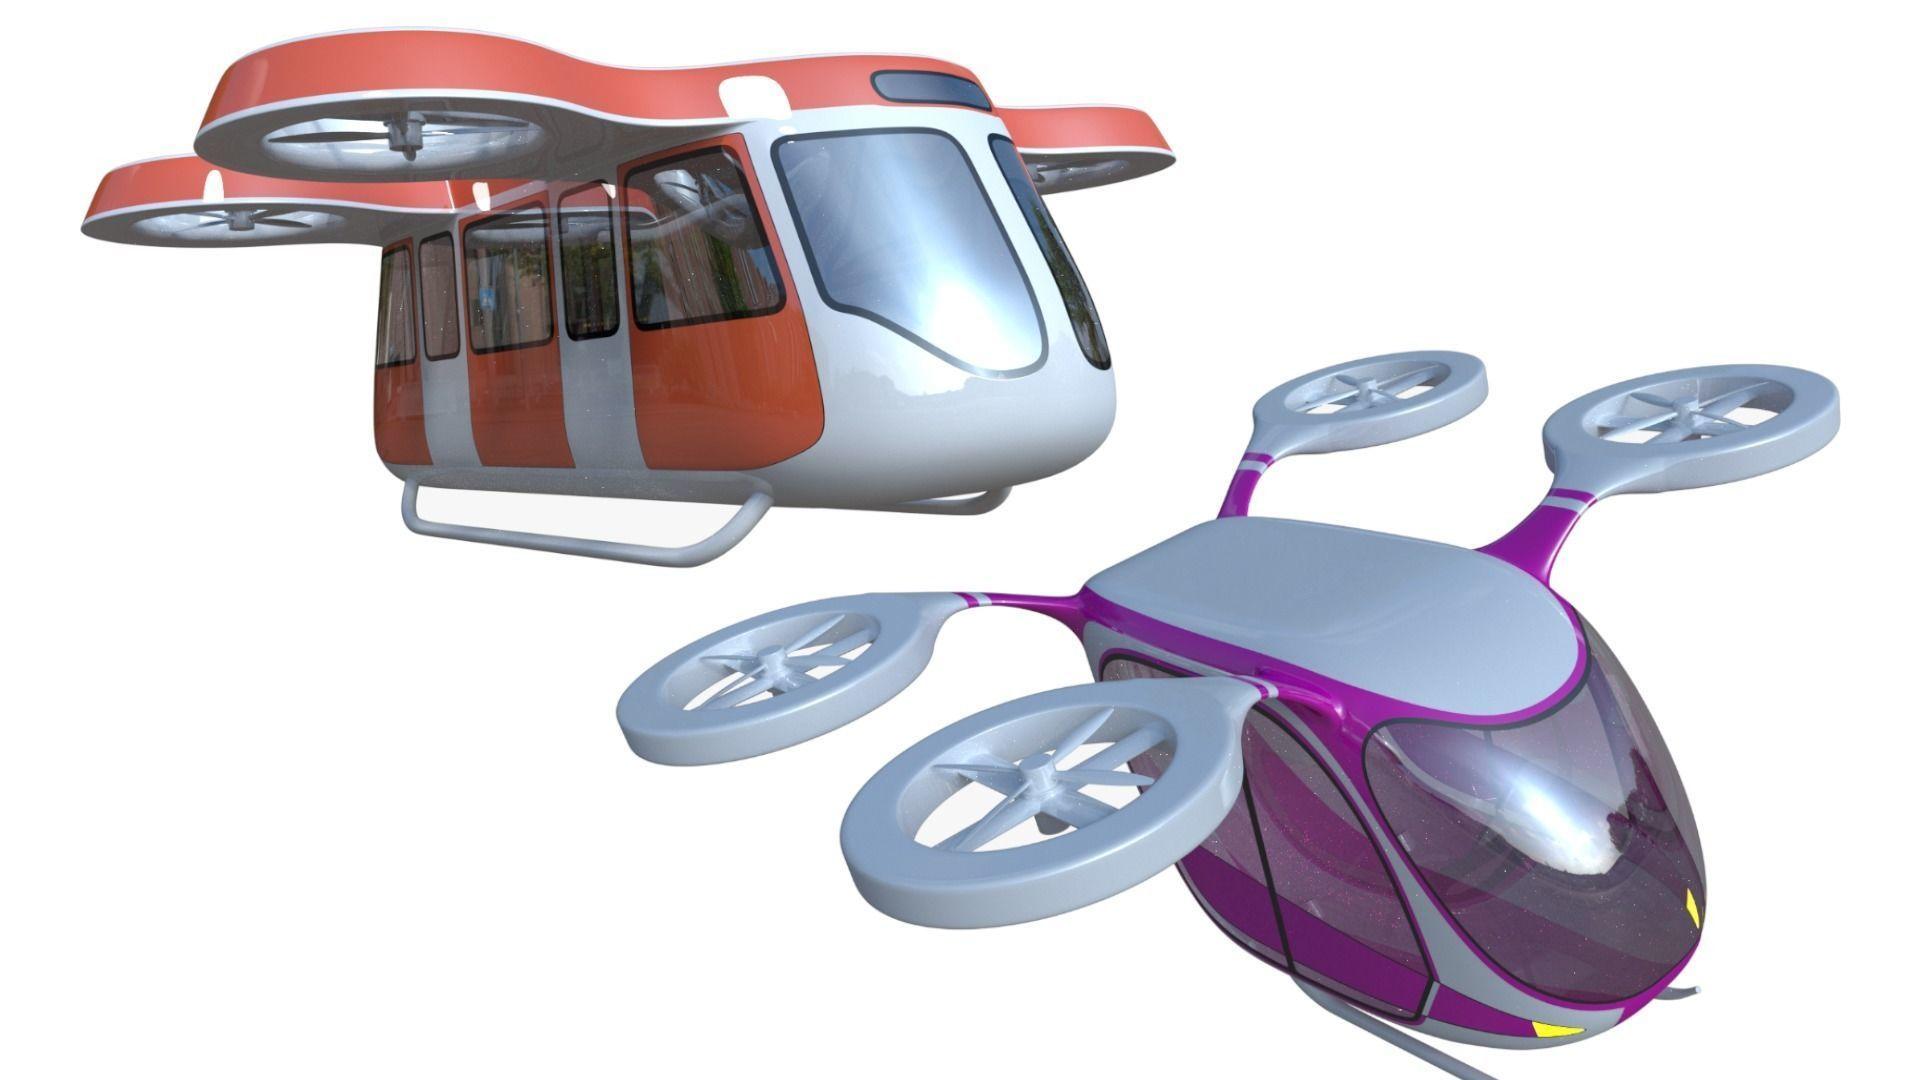 Passenger drones generic